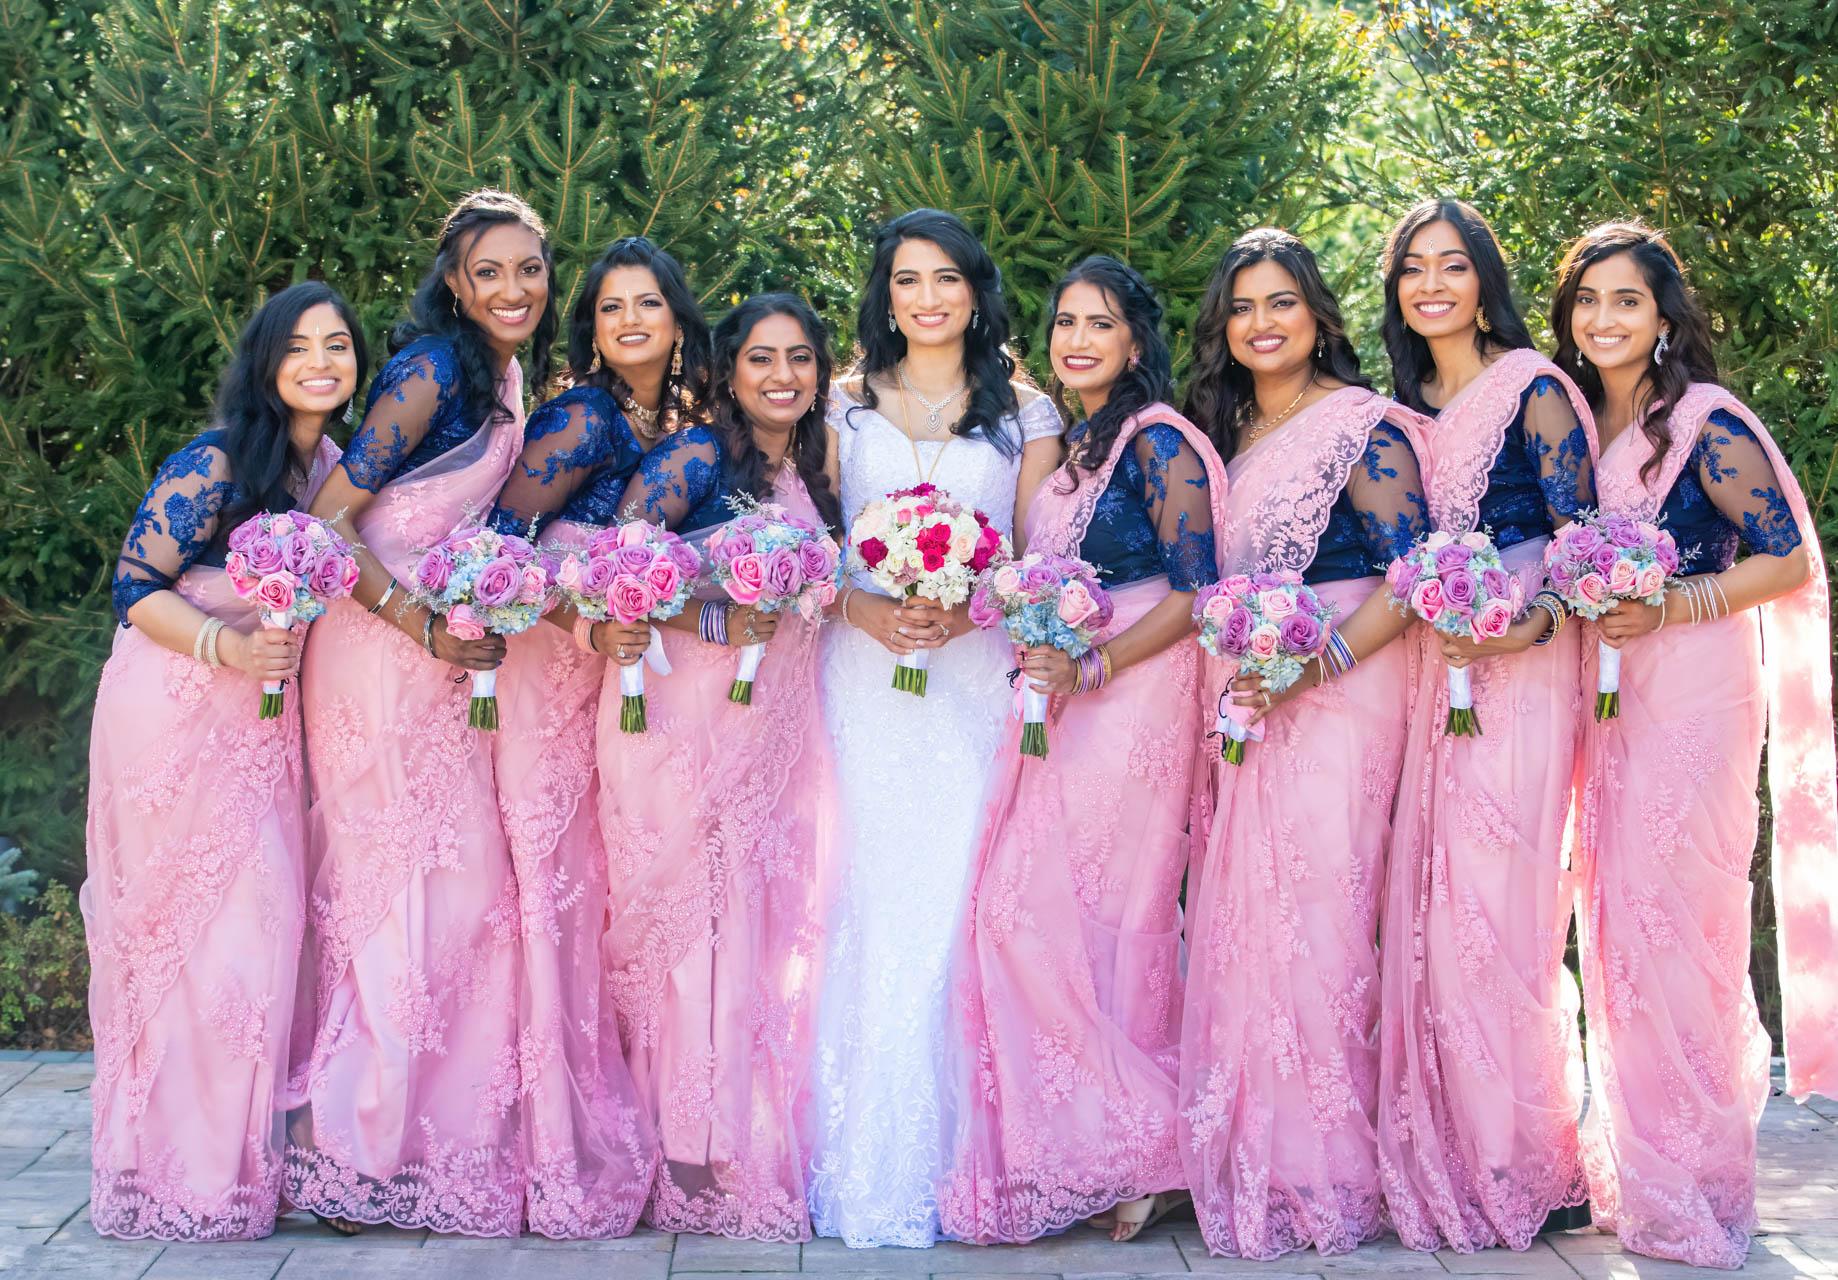 WESTMOUNT COUNTRY CLUB INDIAN WEDDING 22